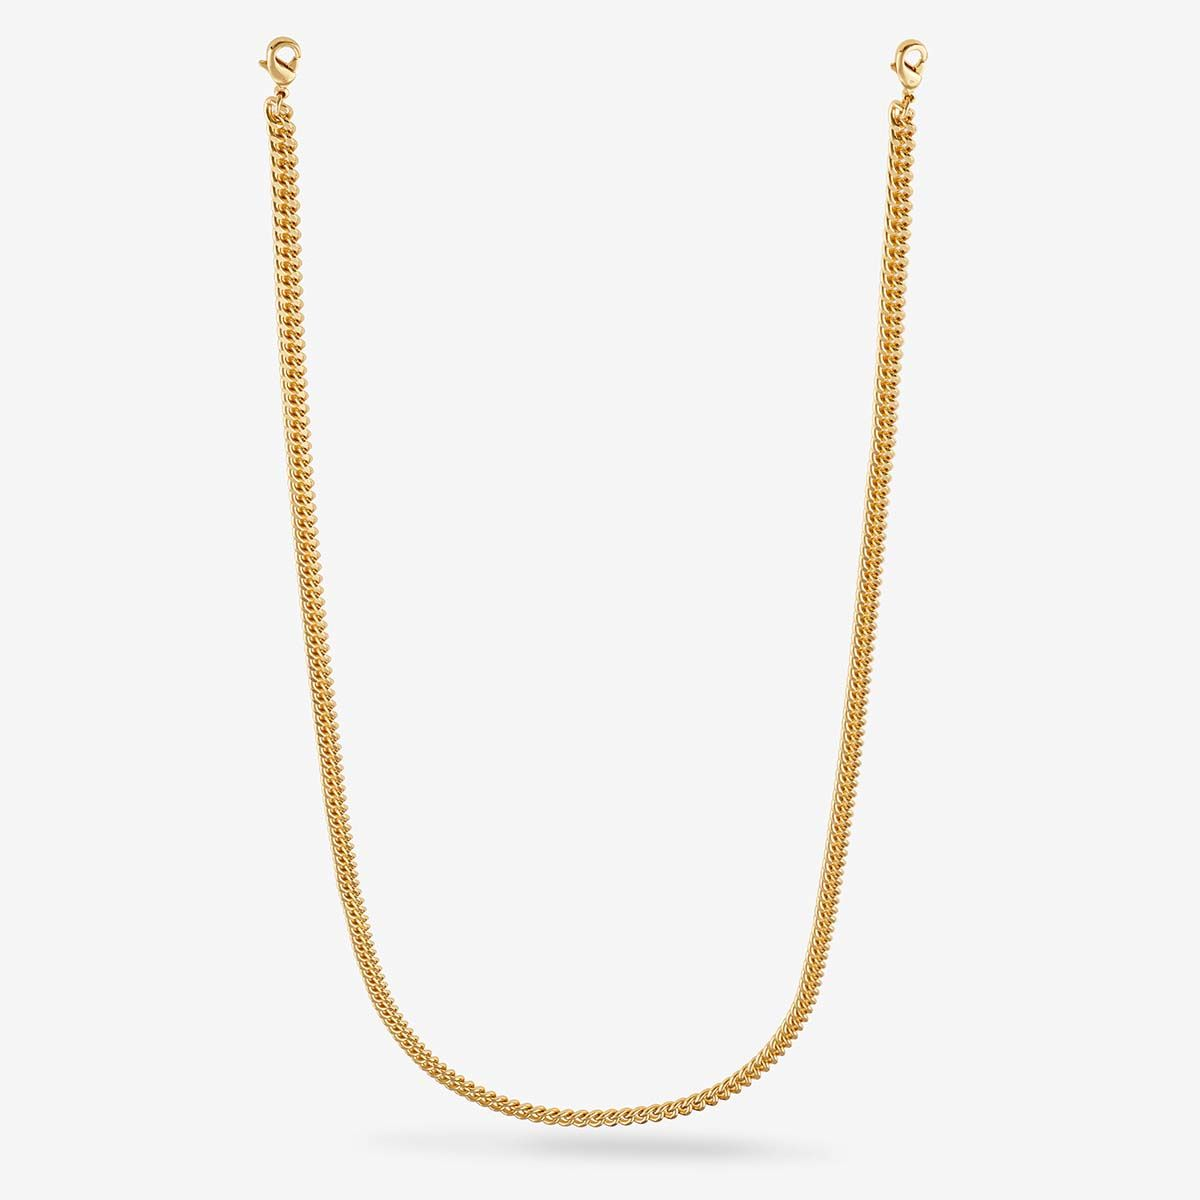 Luisa - Halsketten - 18k vergoldet